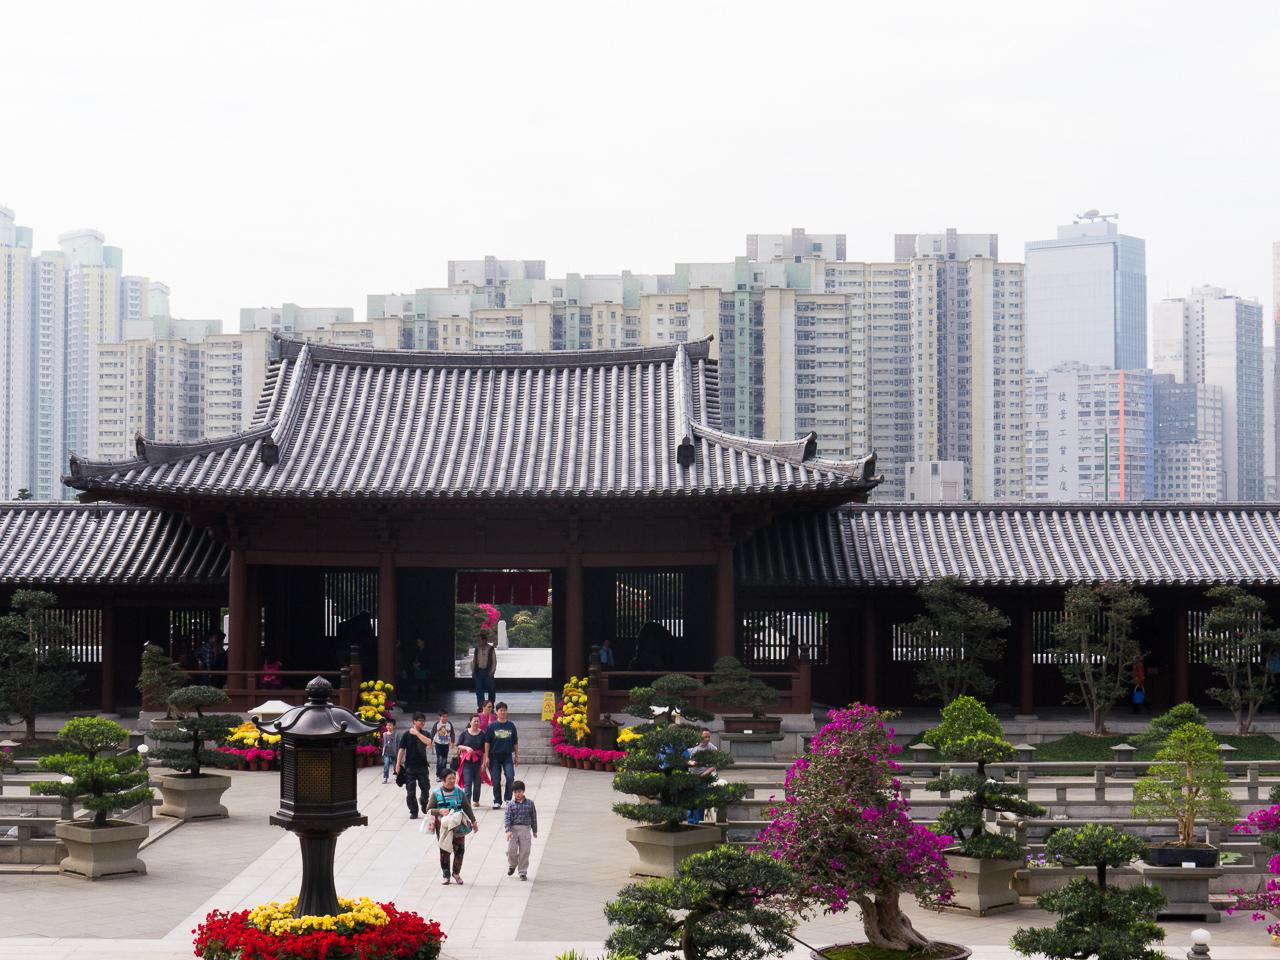 Hongkong – Tag 3: Chi Lin Nunnery, Nan Lian Garden, Flower und Goldfish Market